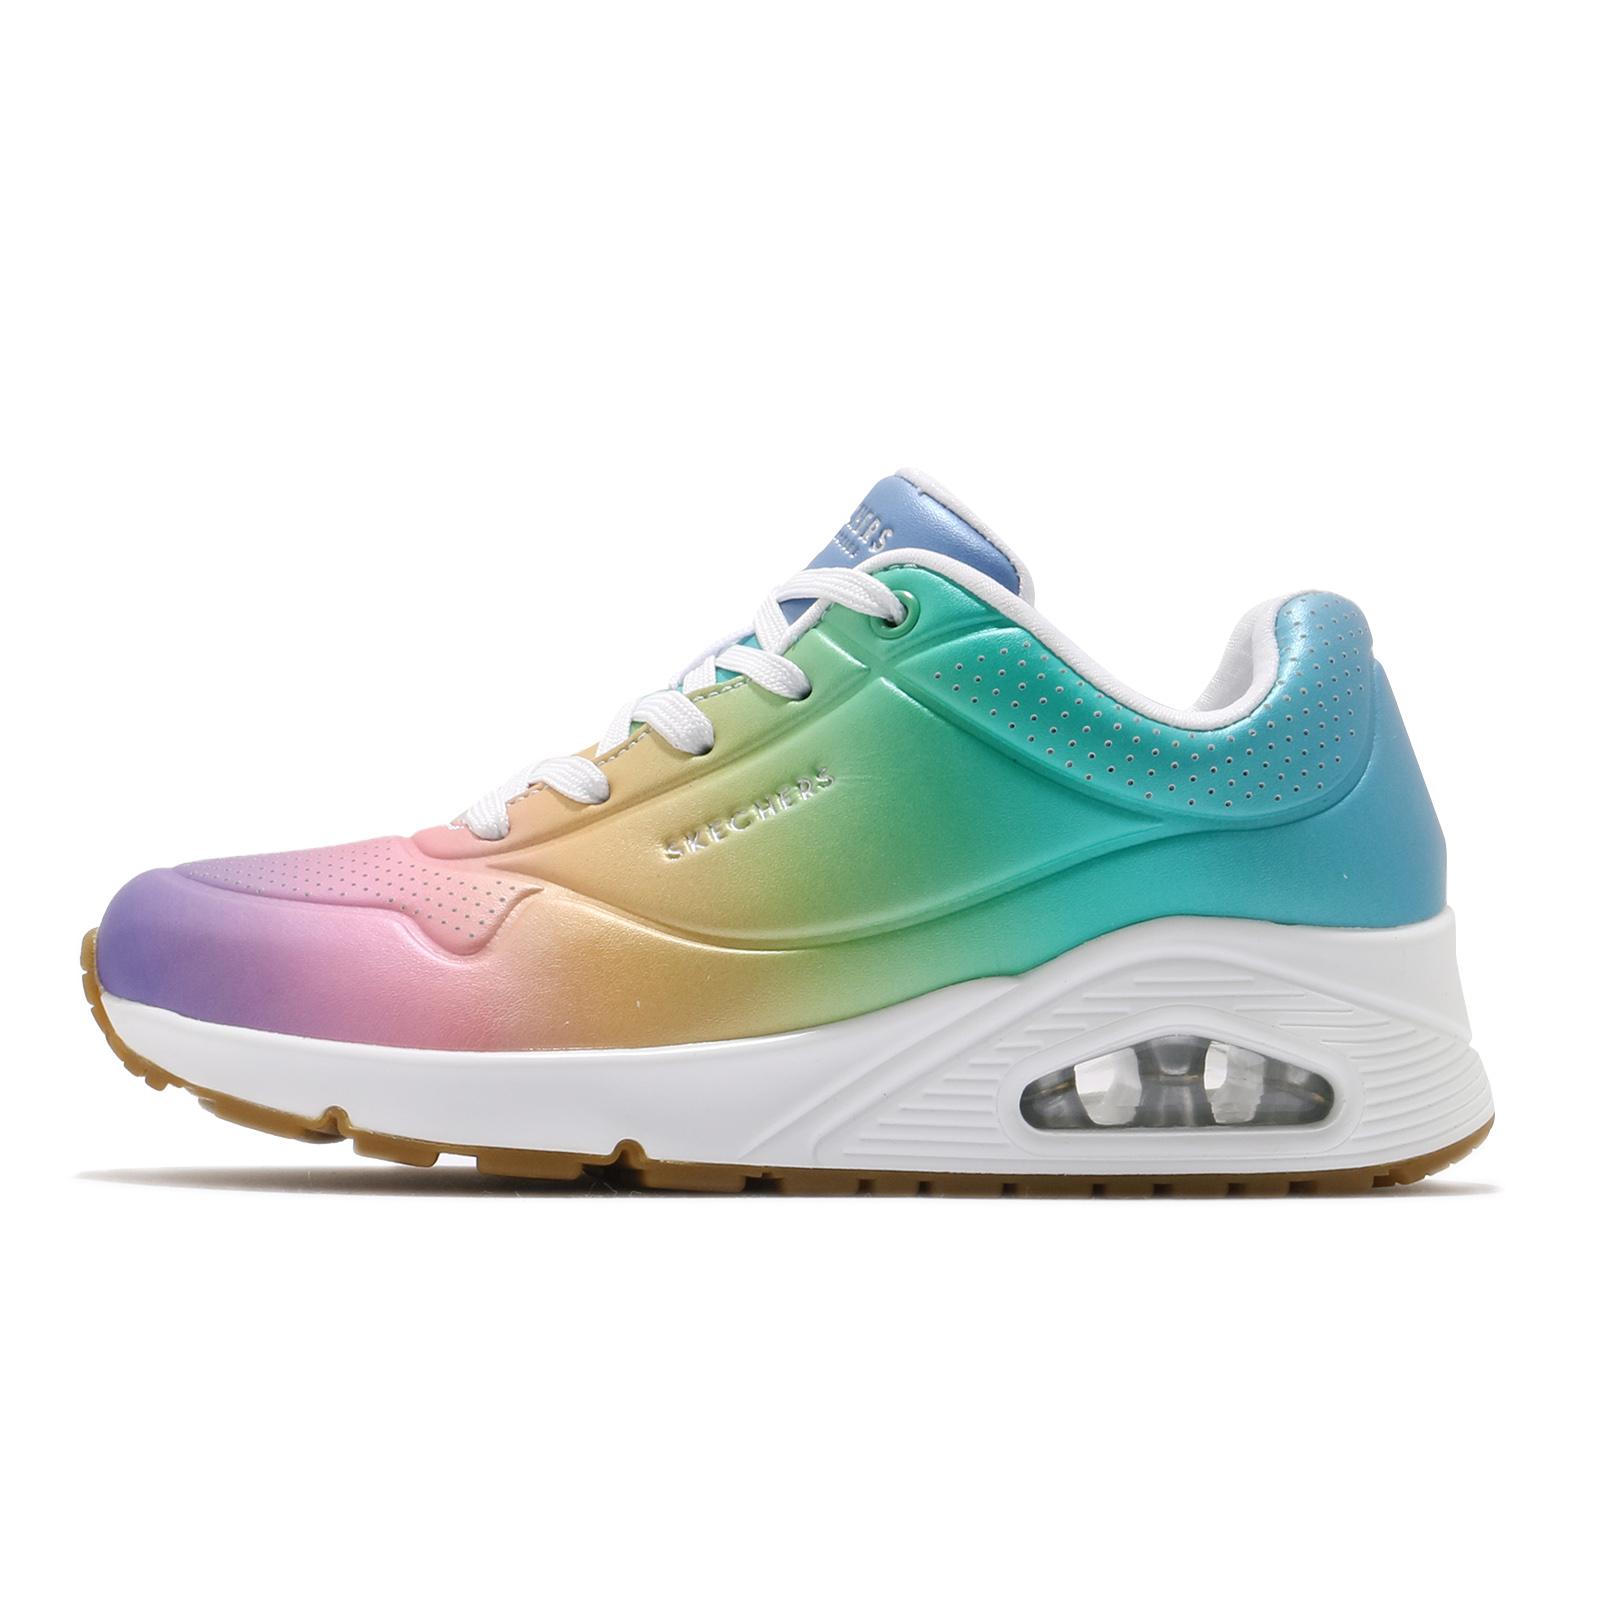 Skechers 休閒鞋 Uno-Spectrum 彩色 漸層 氣墊 彩虹配色 女鞋 【ACS】 155130WMLT